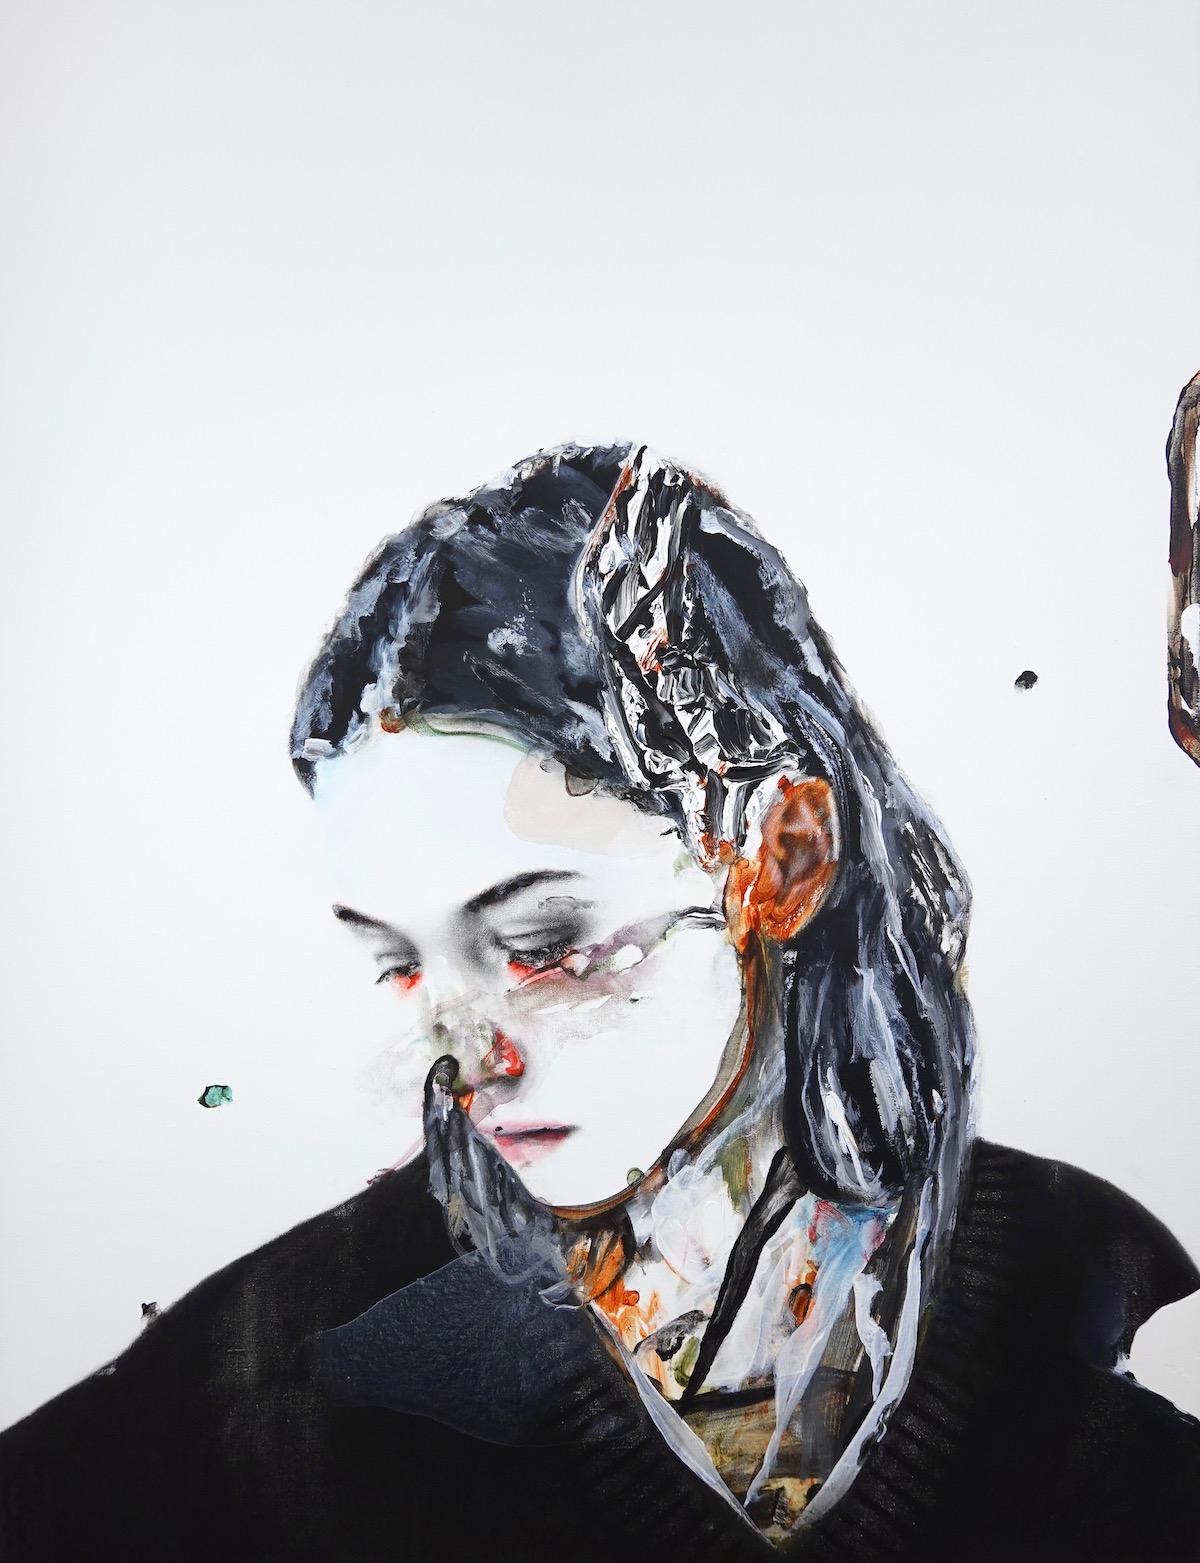 antoine cordet canvas toile peinture painting portrait art artist artiste peintre acrylic oil I'm wearing two forests